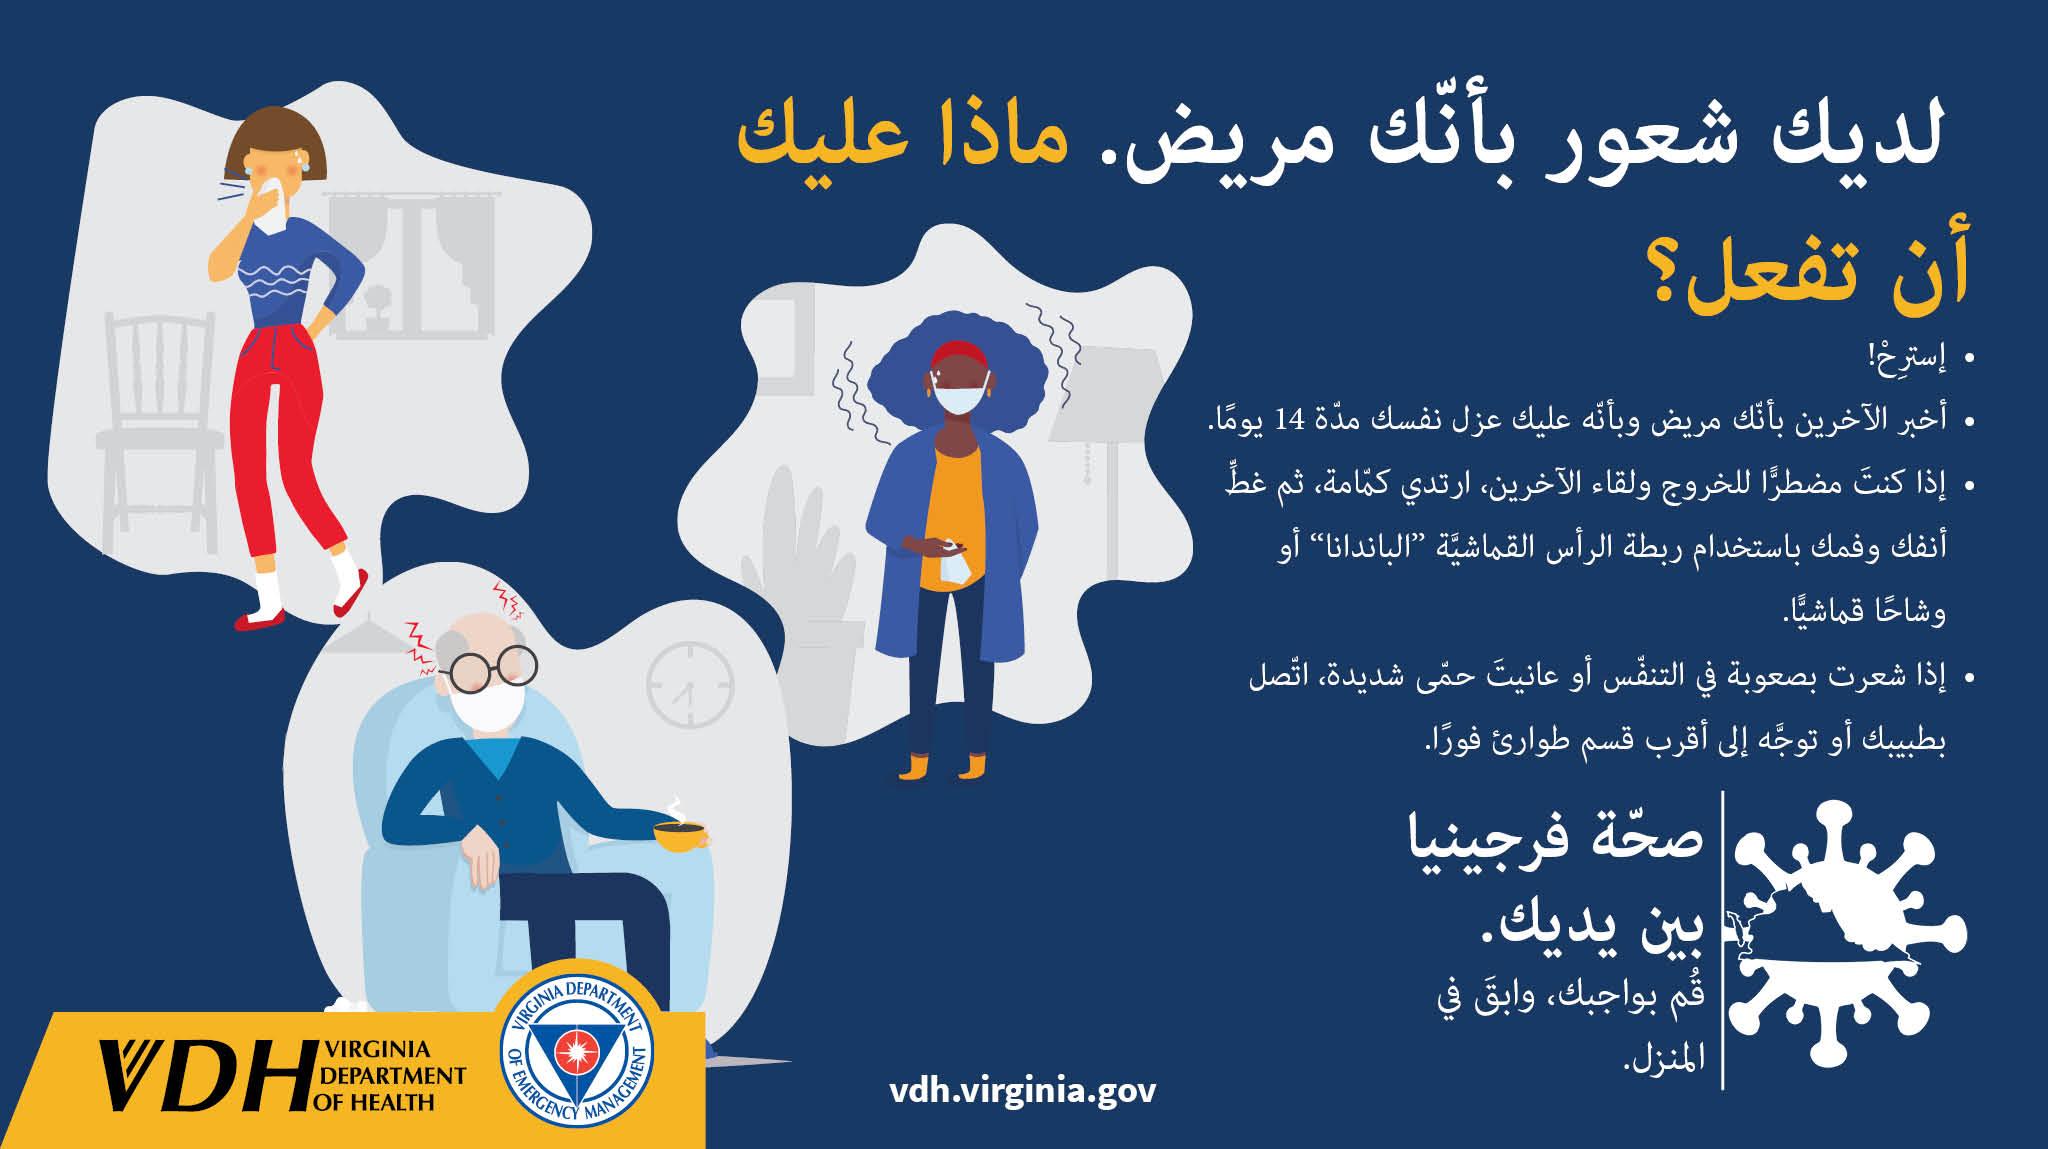 Fairfax County Car Tax >> (COVID-19 Arabic Information) COVID-19 معلومات باللغة العربية حول فيروس | COVID19